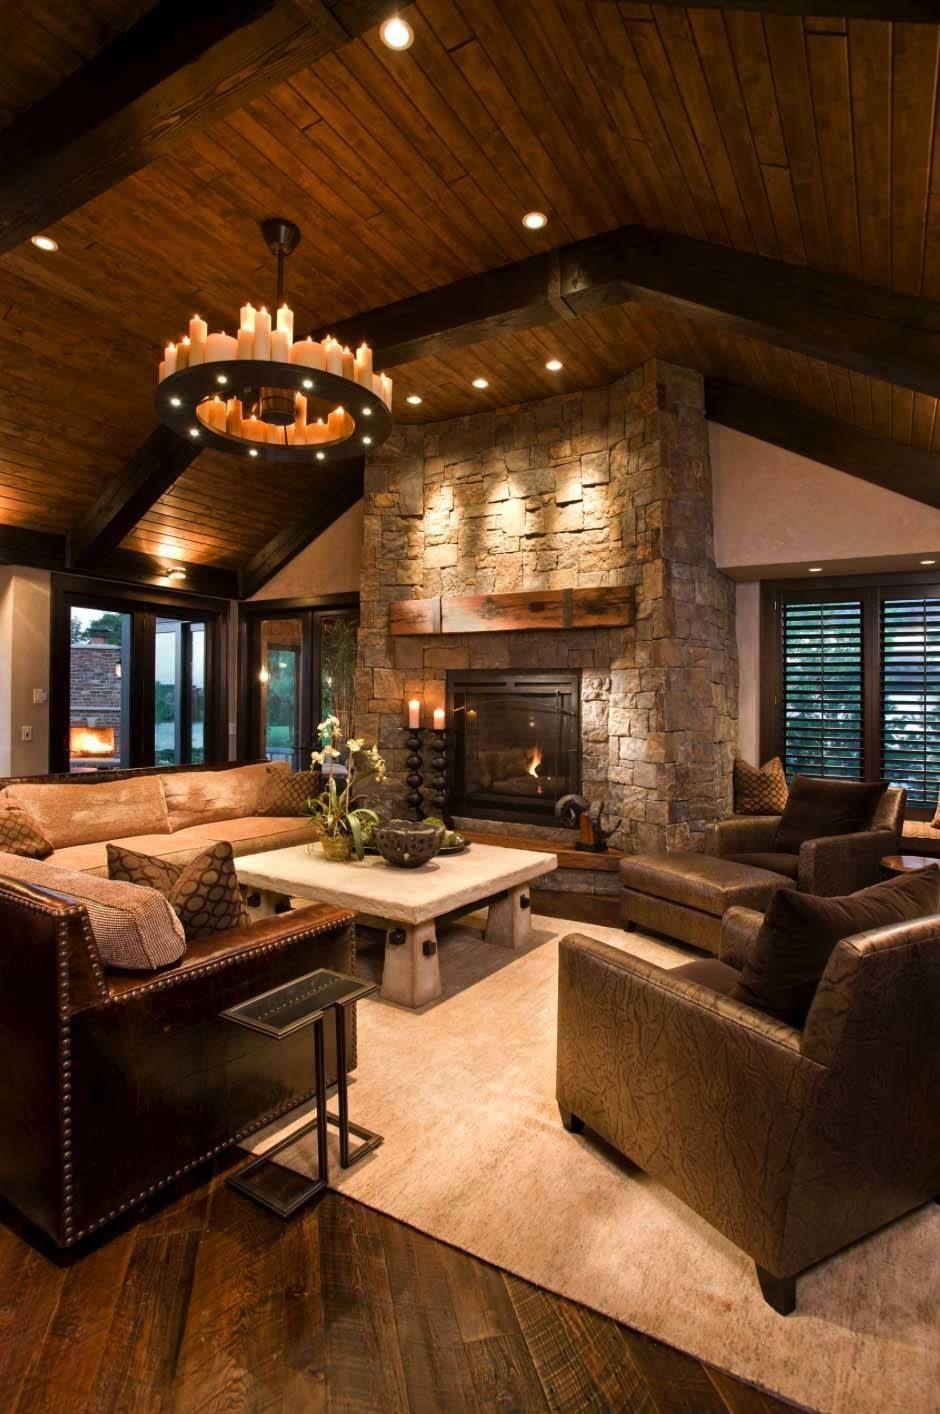 Home interior design living room modern meets rustic in unbelievably designed minnesota home  modern